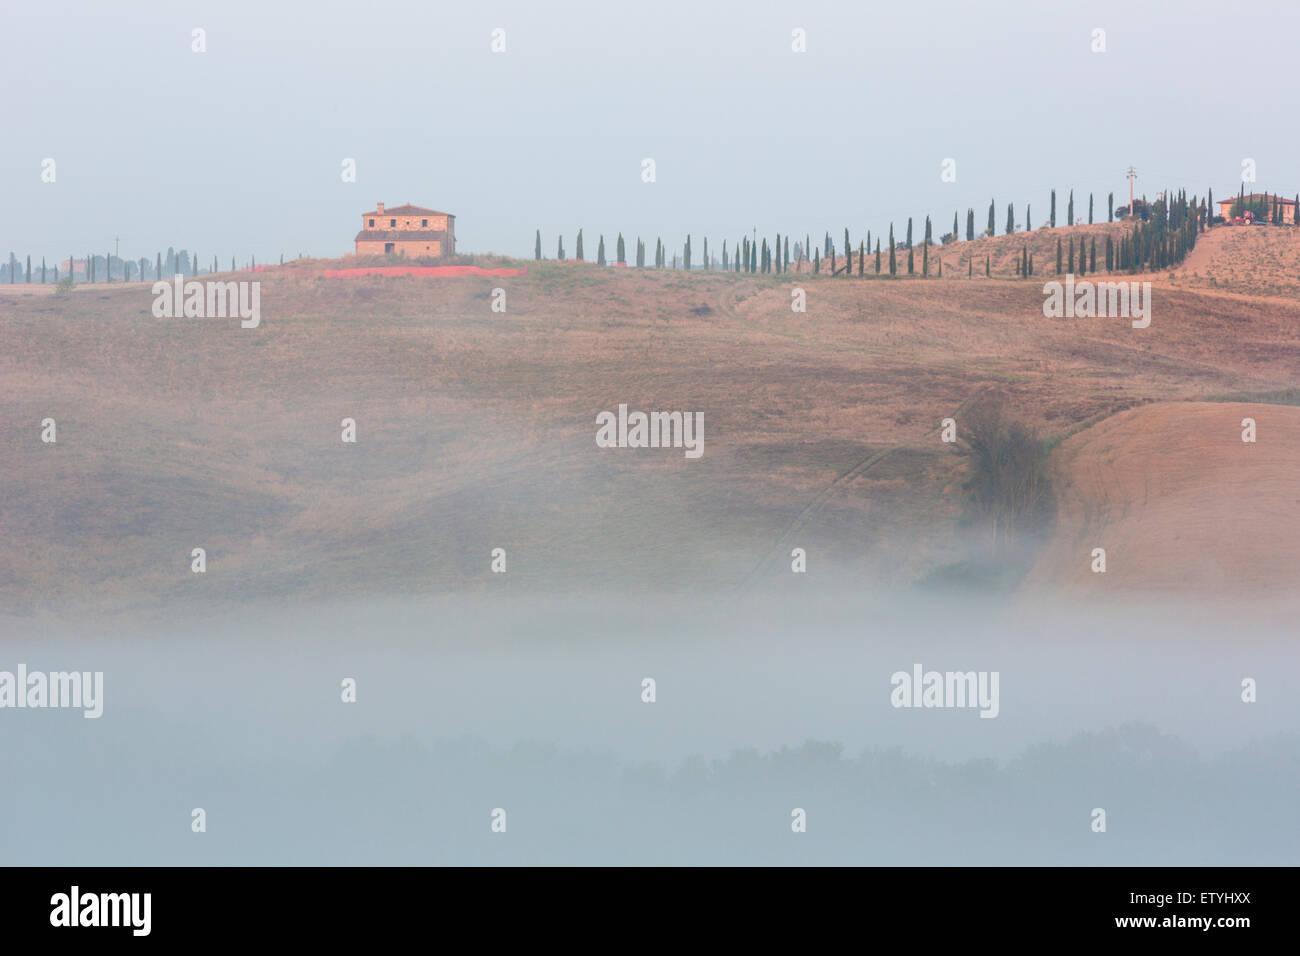 Blick über landwirtschaftliche Landschaft im Val d'Chiana in Toskana, Italien Stockbild